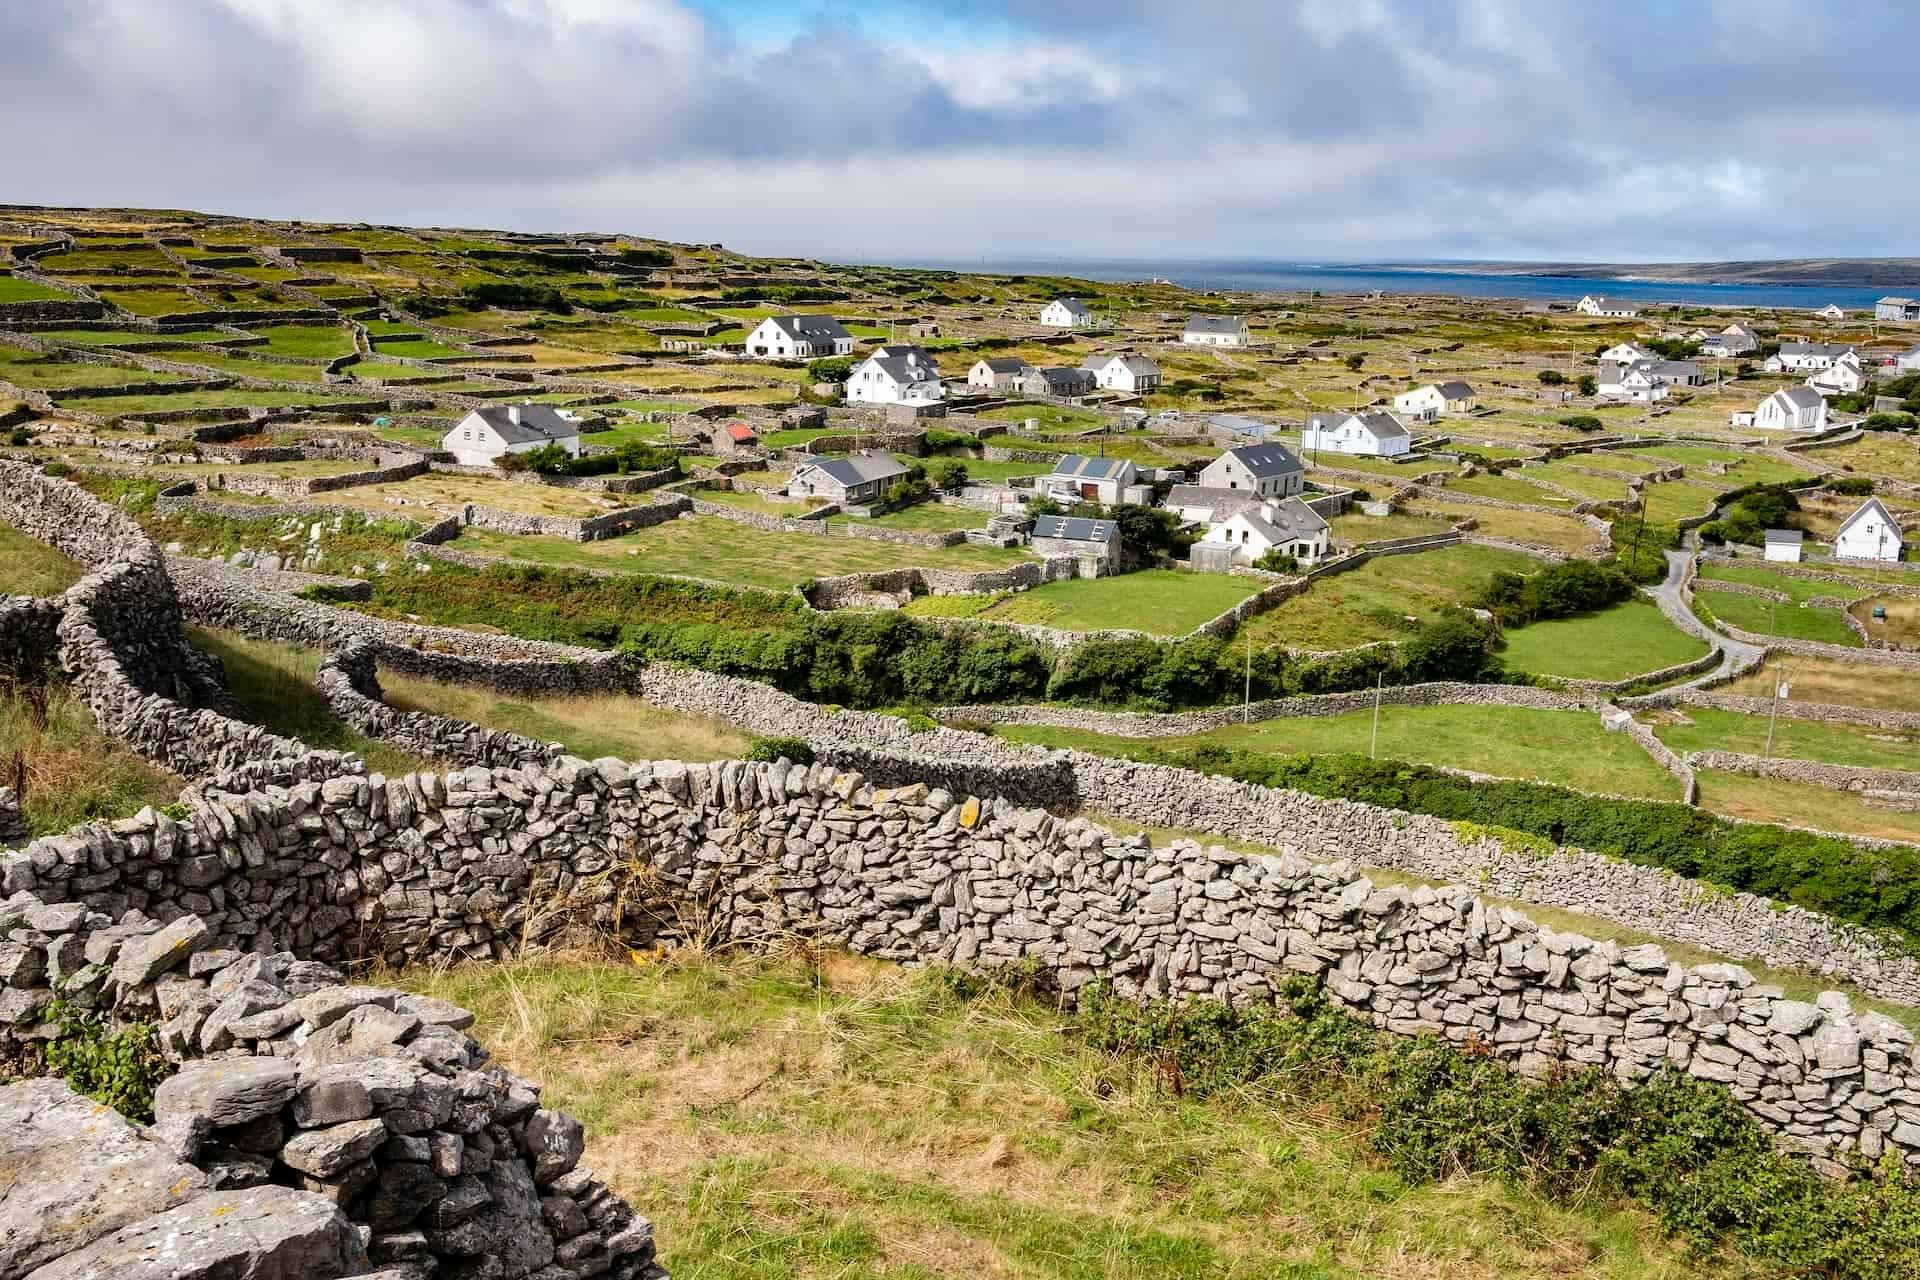 Island Hopping in Ireland